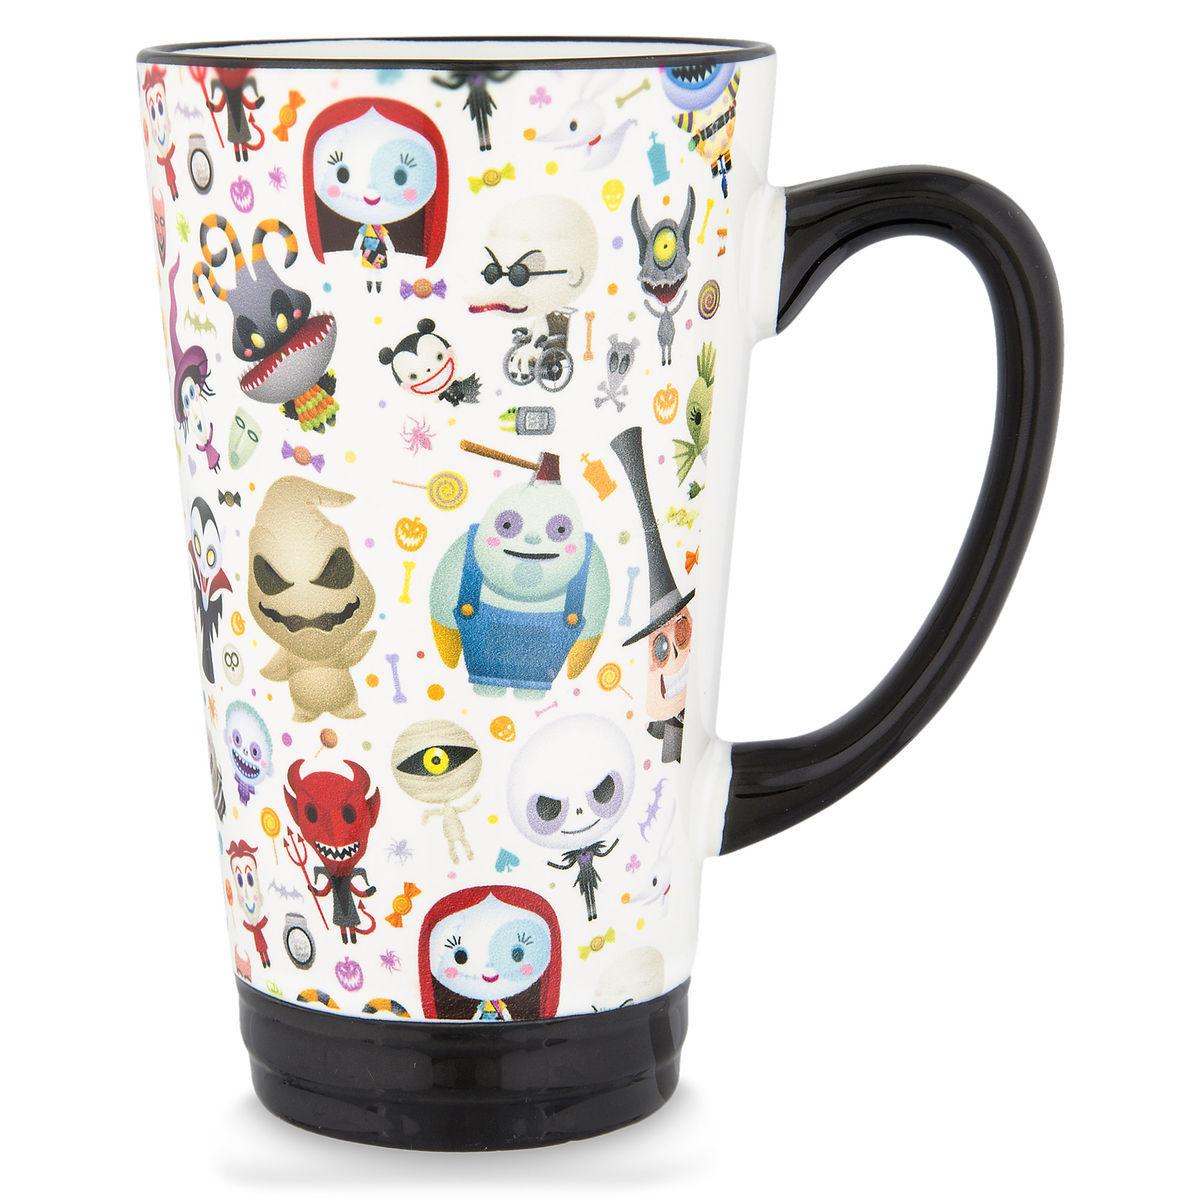 Nightmare Before Christmas Coffee Mug.Disney Coffee Cup The Nightmare Before Christmas By Maruyama